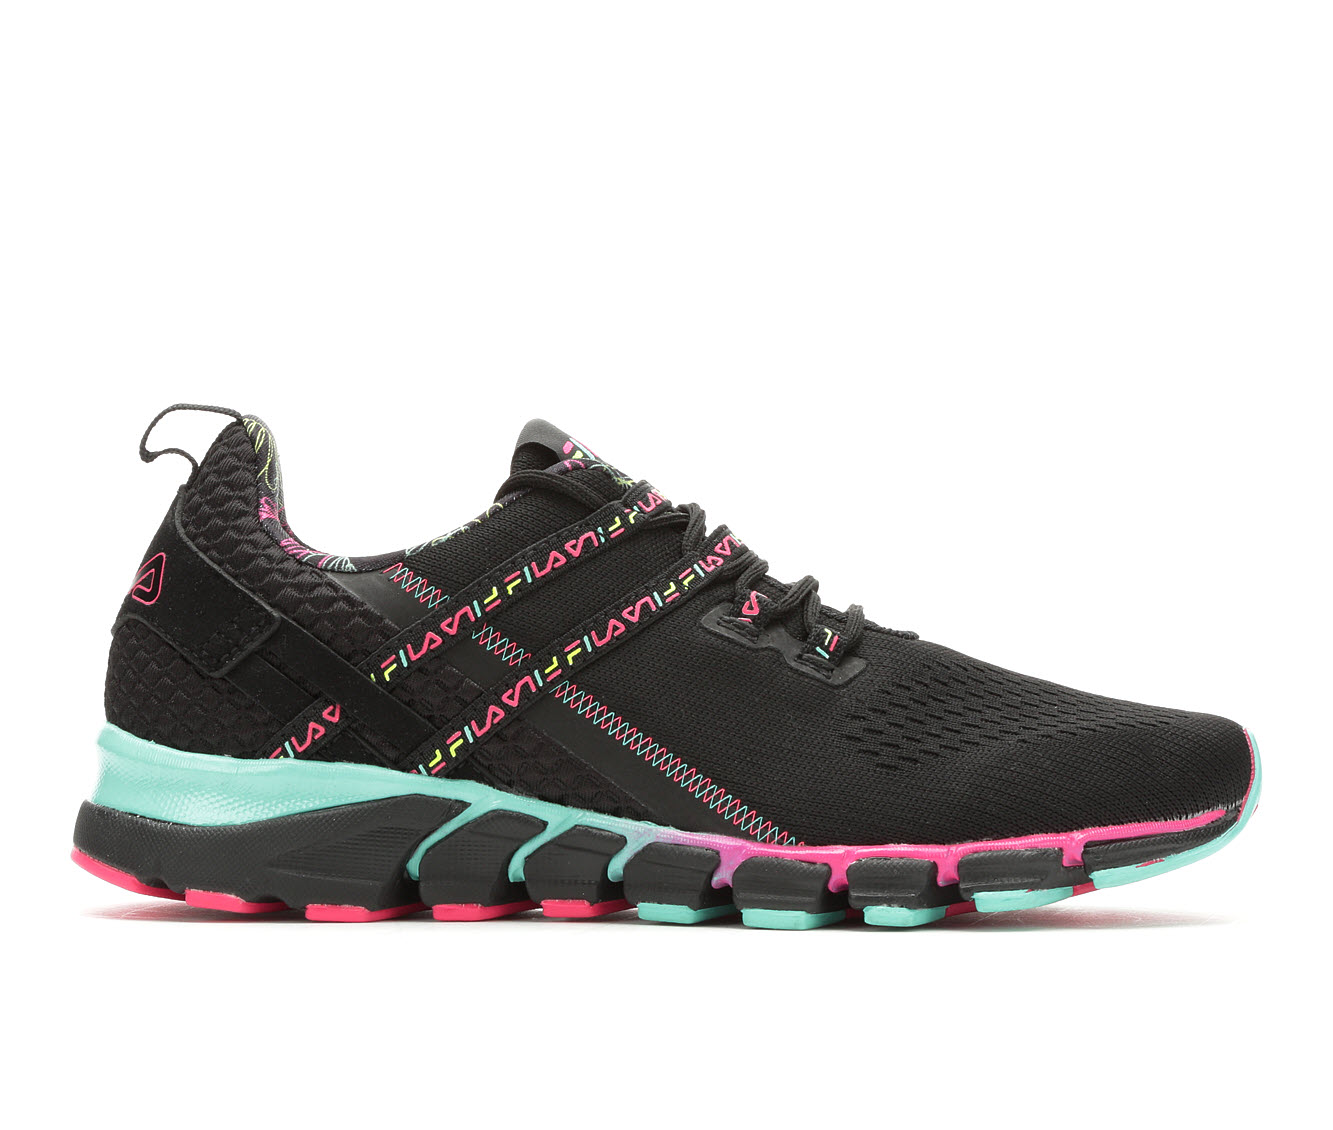 Fila Memory Realmspeed Evo Women's Athletic Shoe (Black)